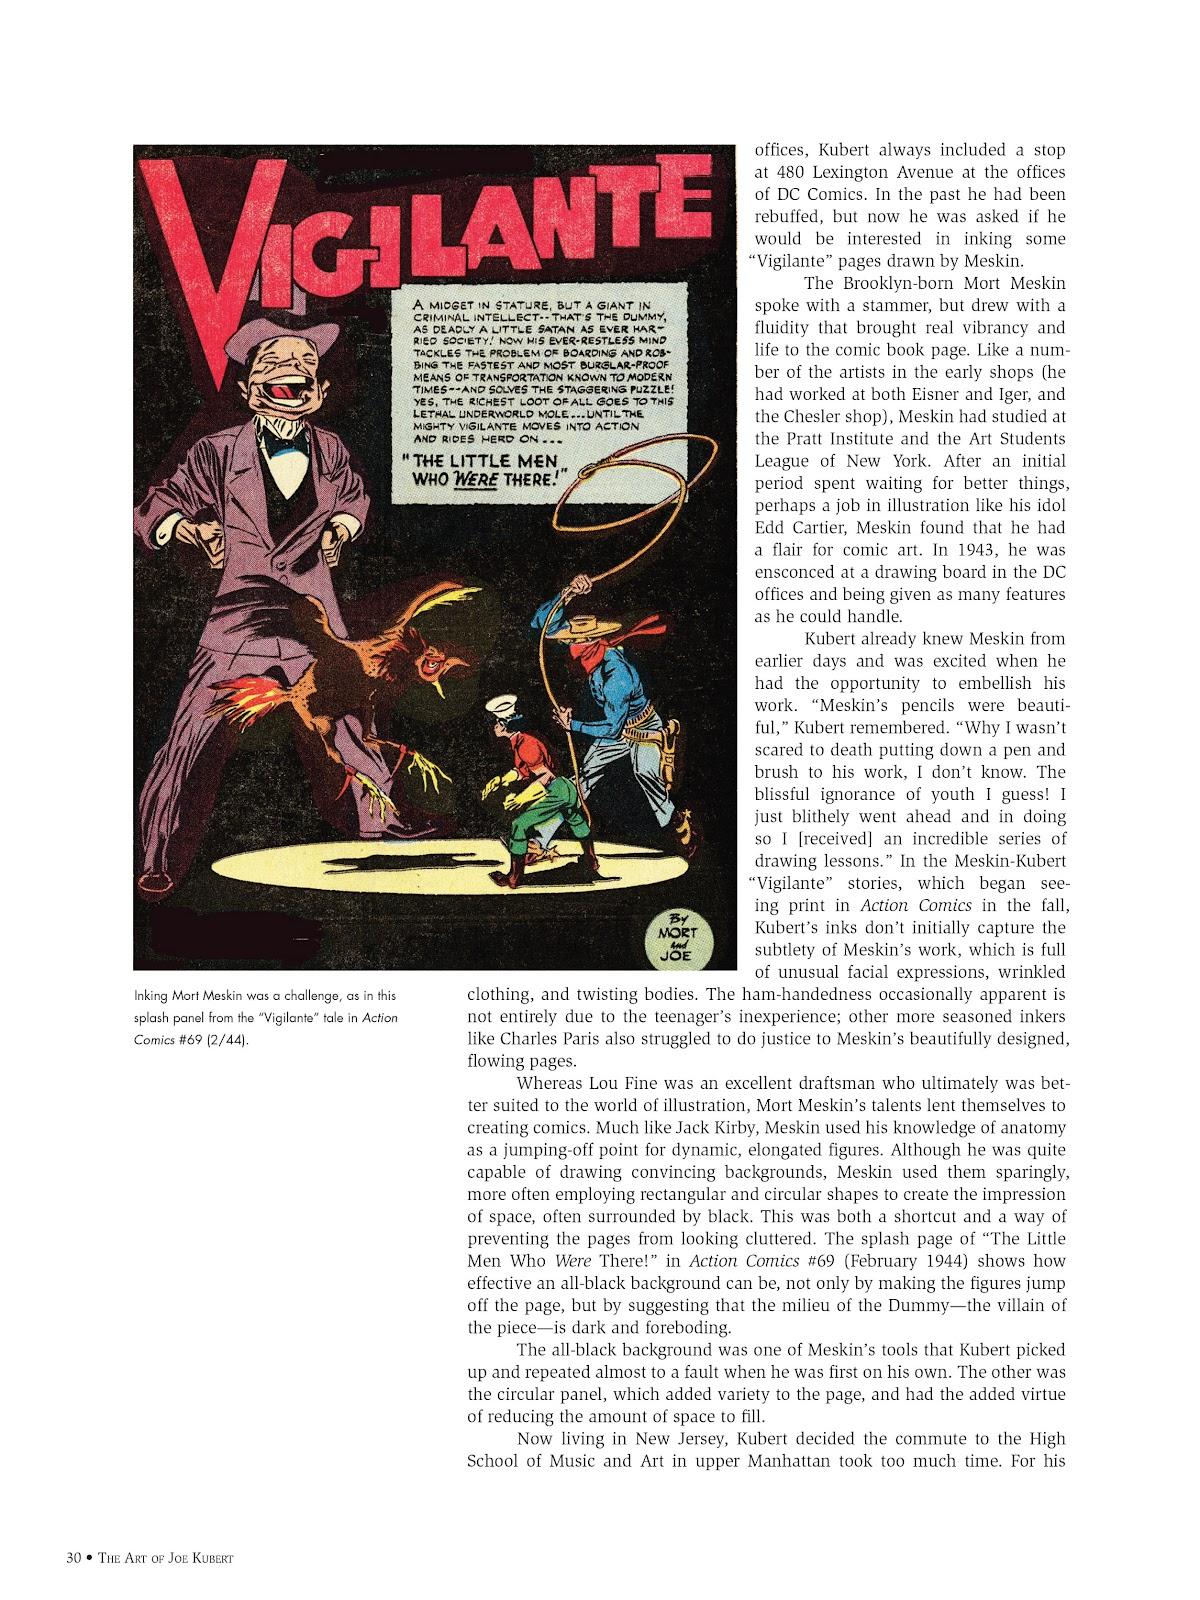 Read online The Art of Joe Kubert comic -  Issue # TPB (Part 1) - 29